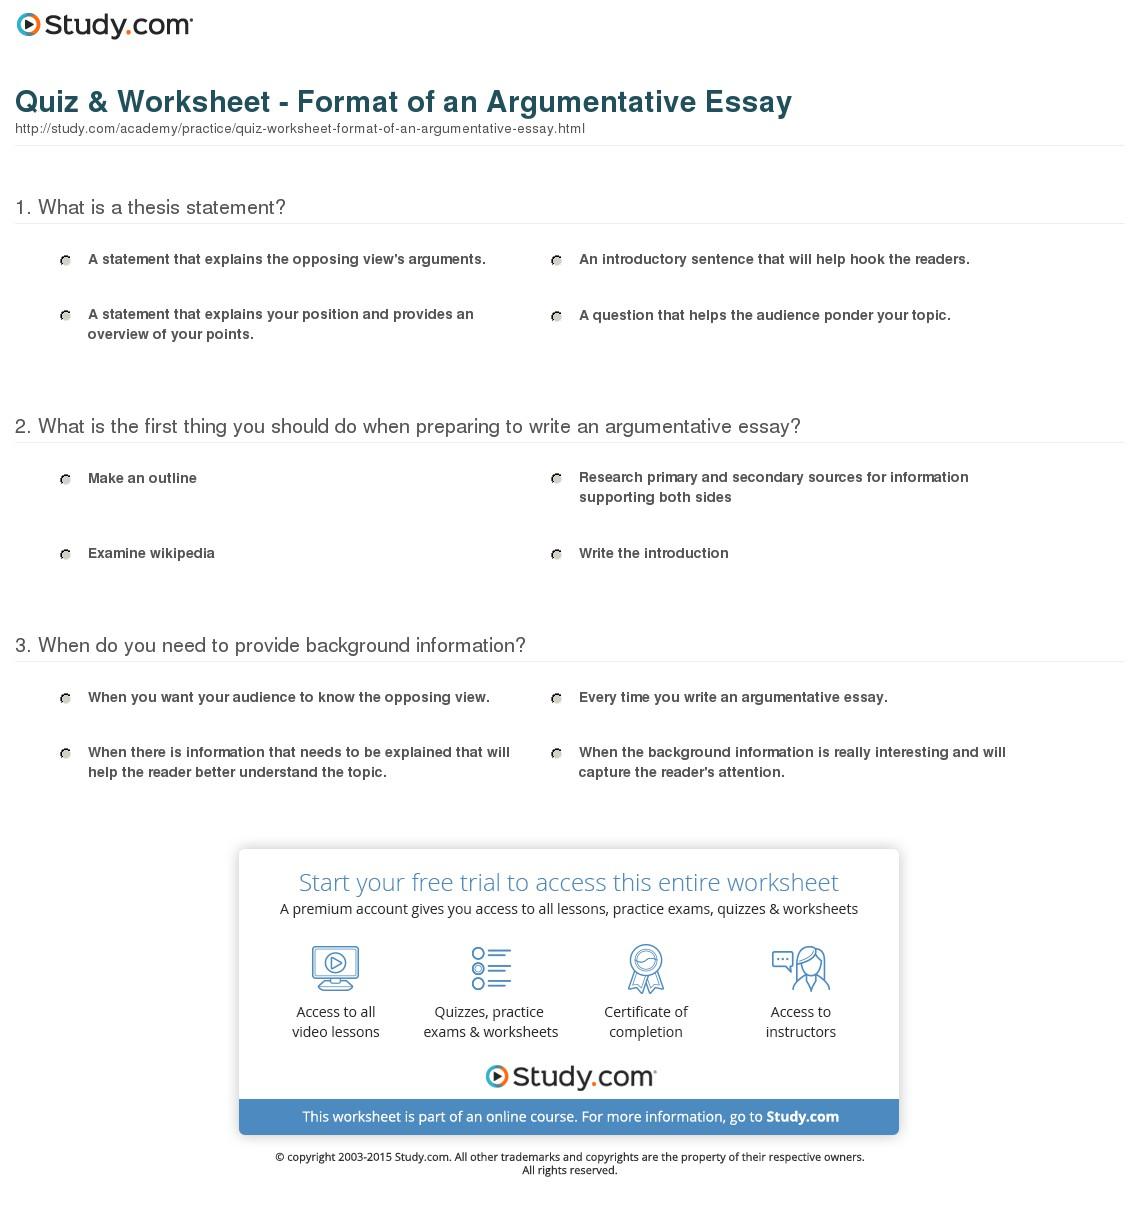 004 Essay Example Quiz Worksheet Format Of An Argumentative Fearsome Definition Define Persuasive/argumentative Pdf Full